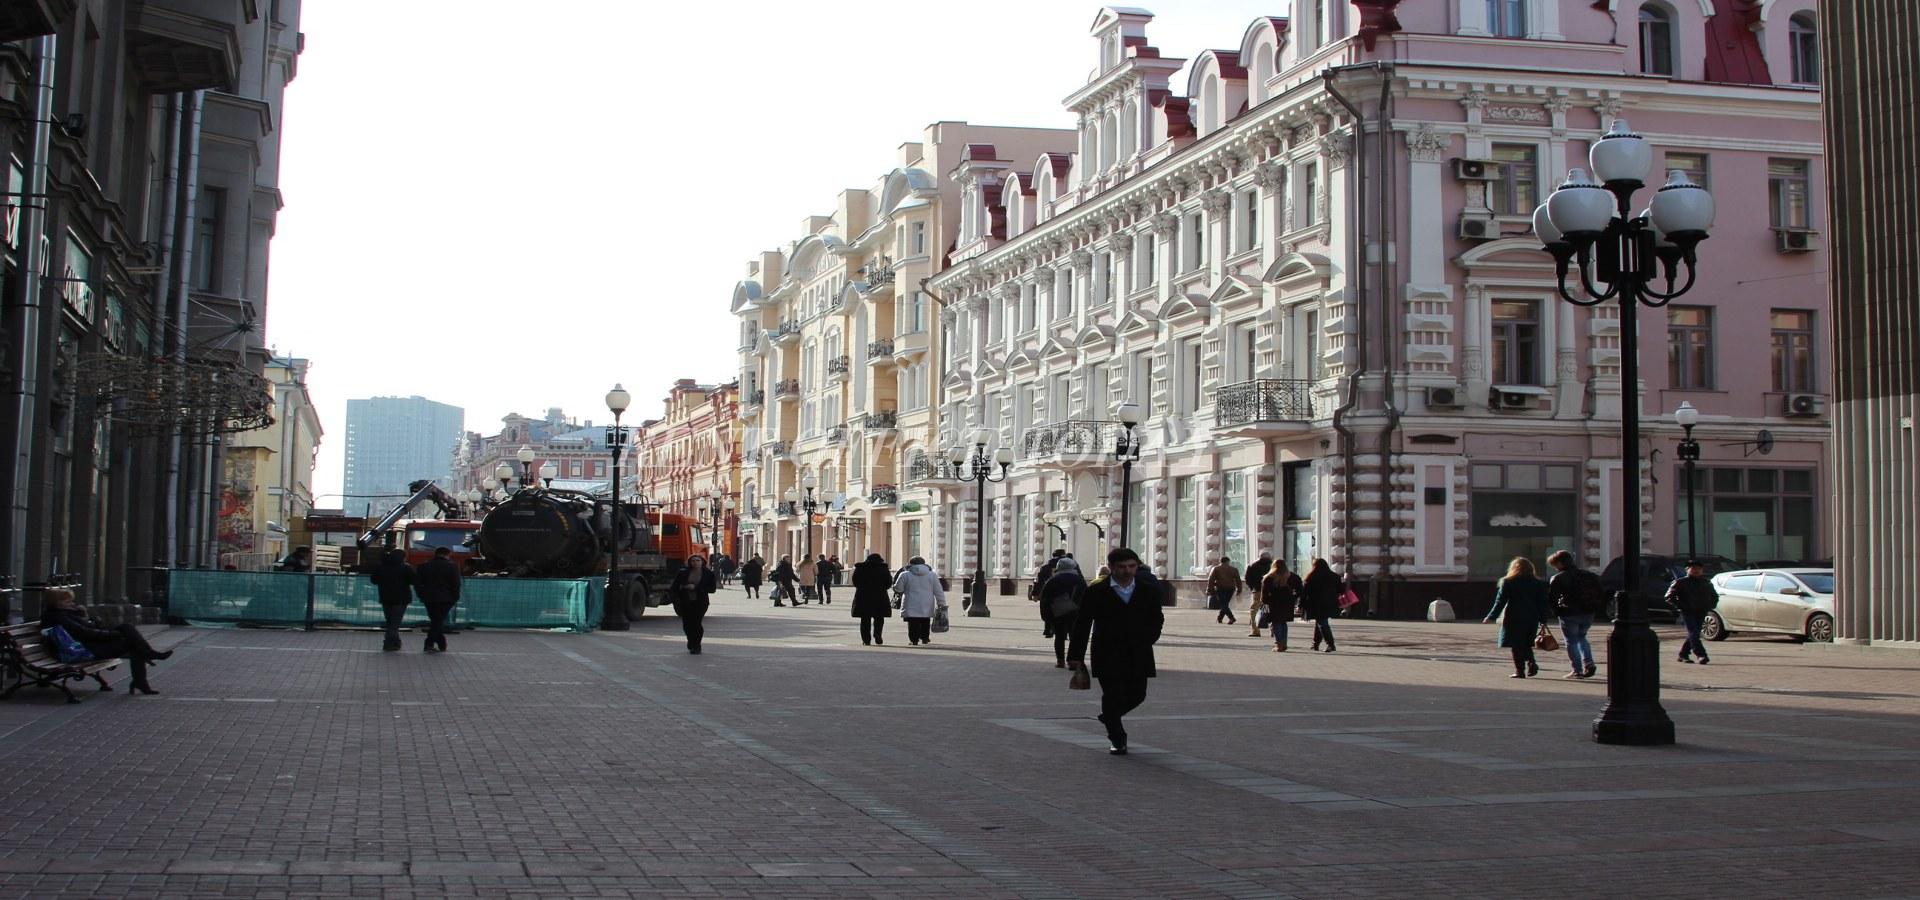 BC-Midland-plaza